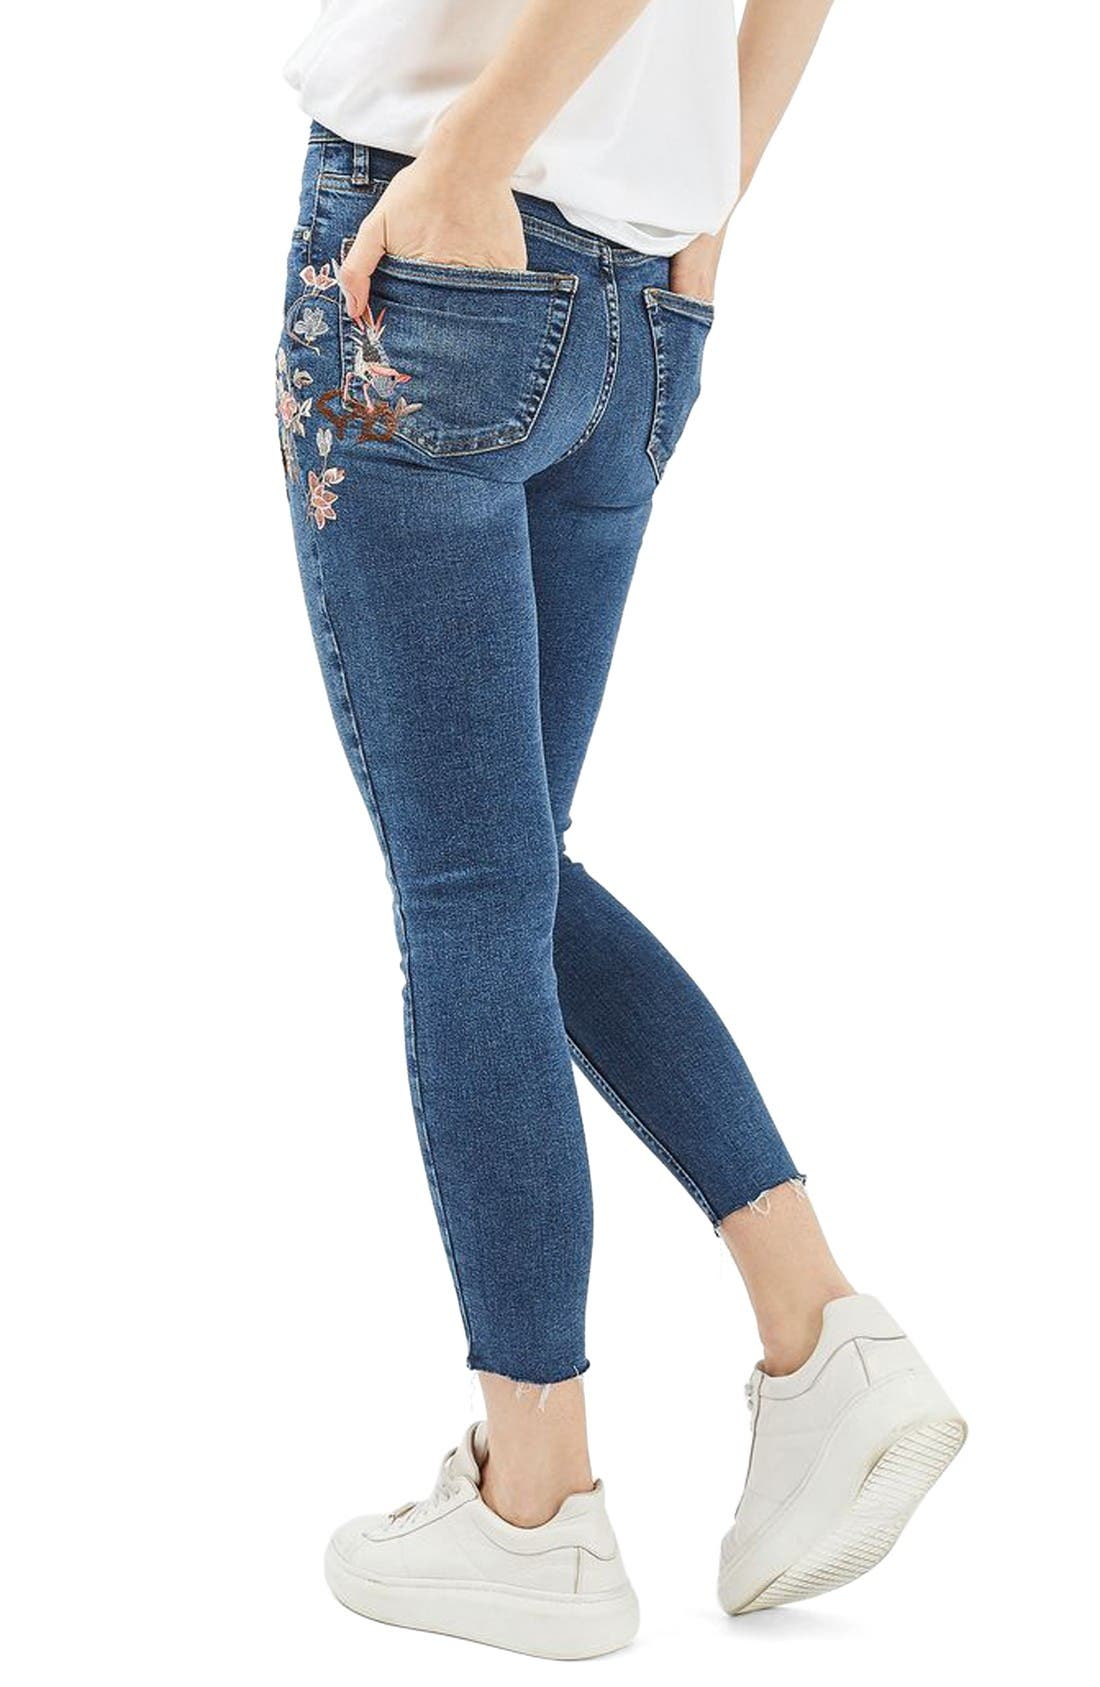 Moto Jamie Embroidered Skinny Jeans,                             Alternate thumbnail 3, color,                             Mid Denim